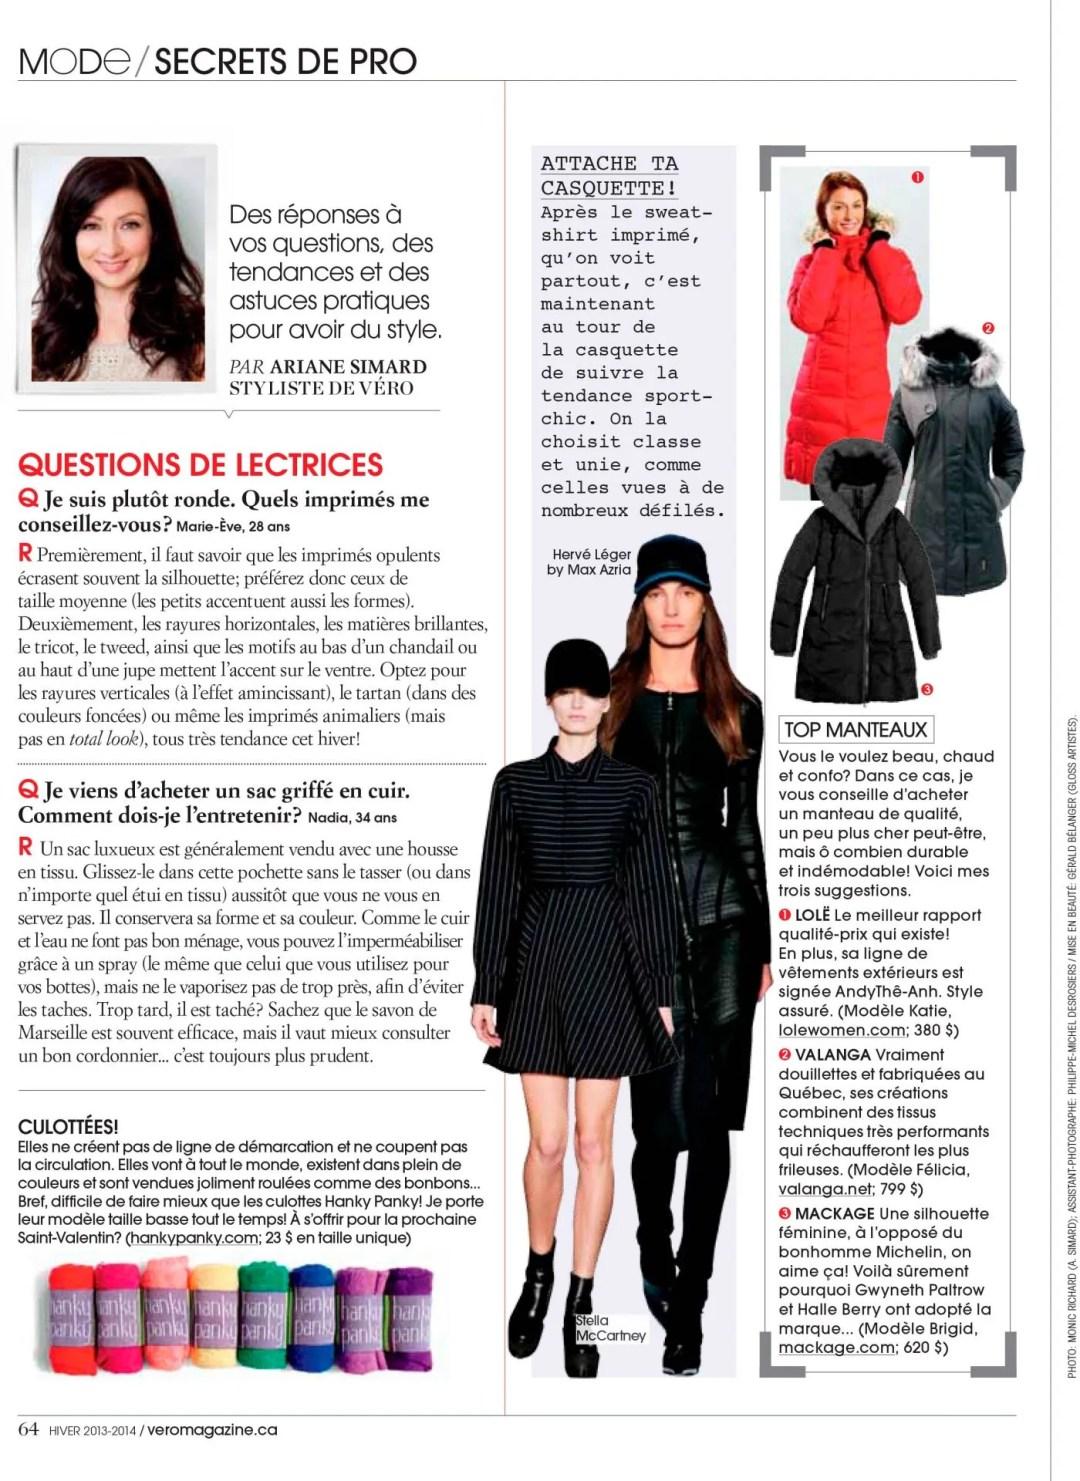 Secrets de pro Magazine VERO Ariane Simard Hiver 2013 2014